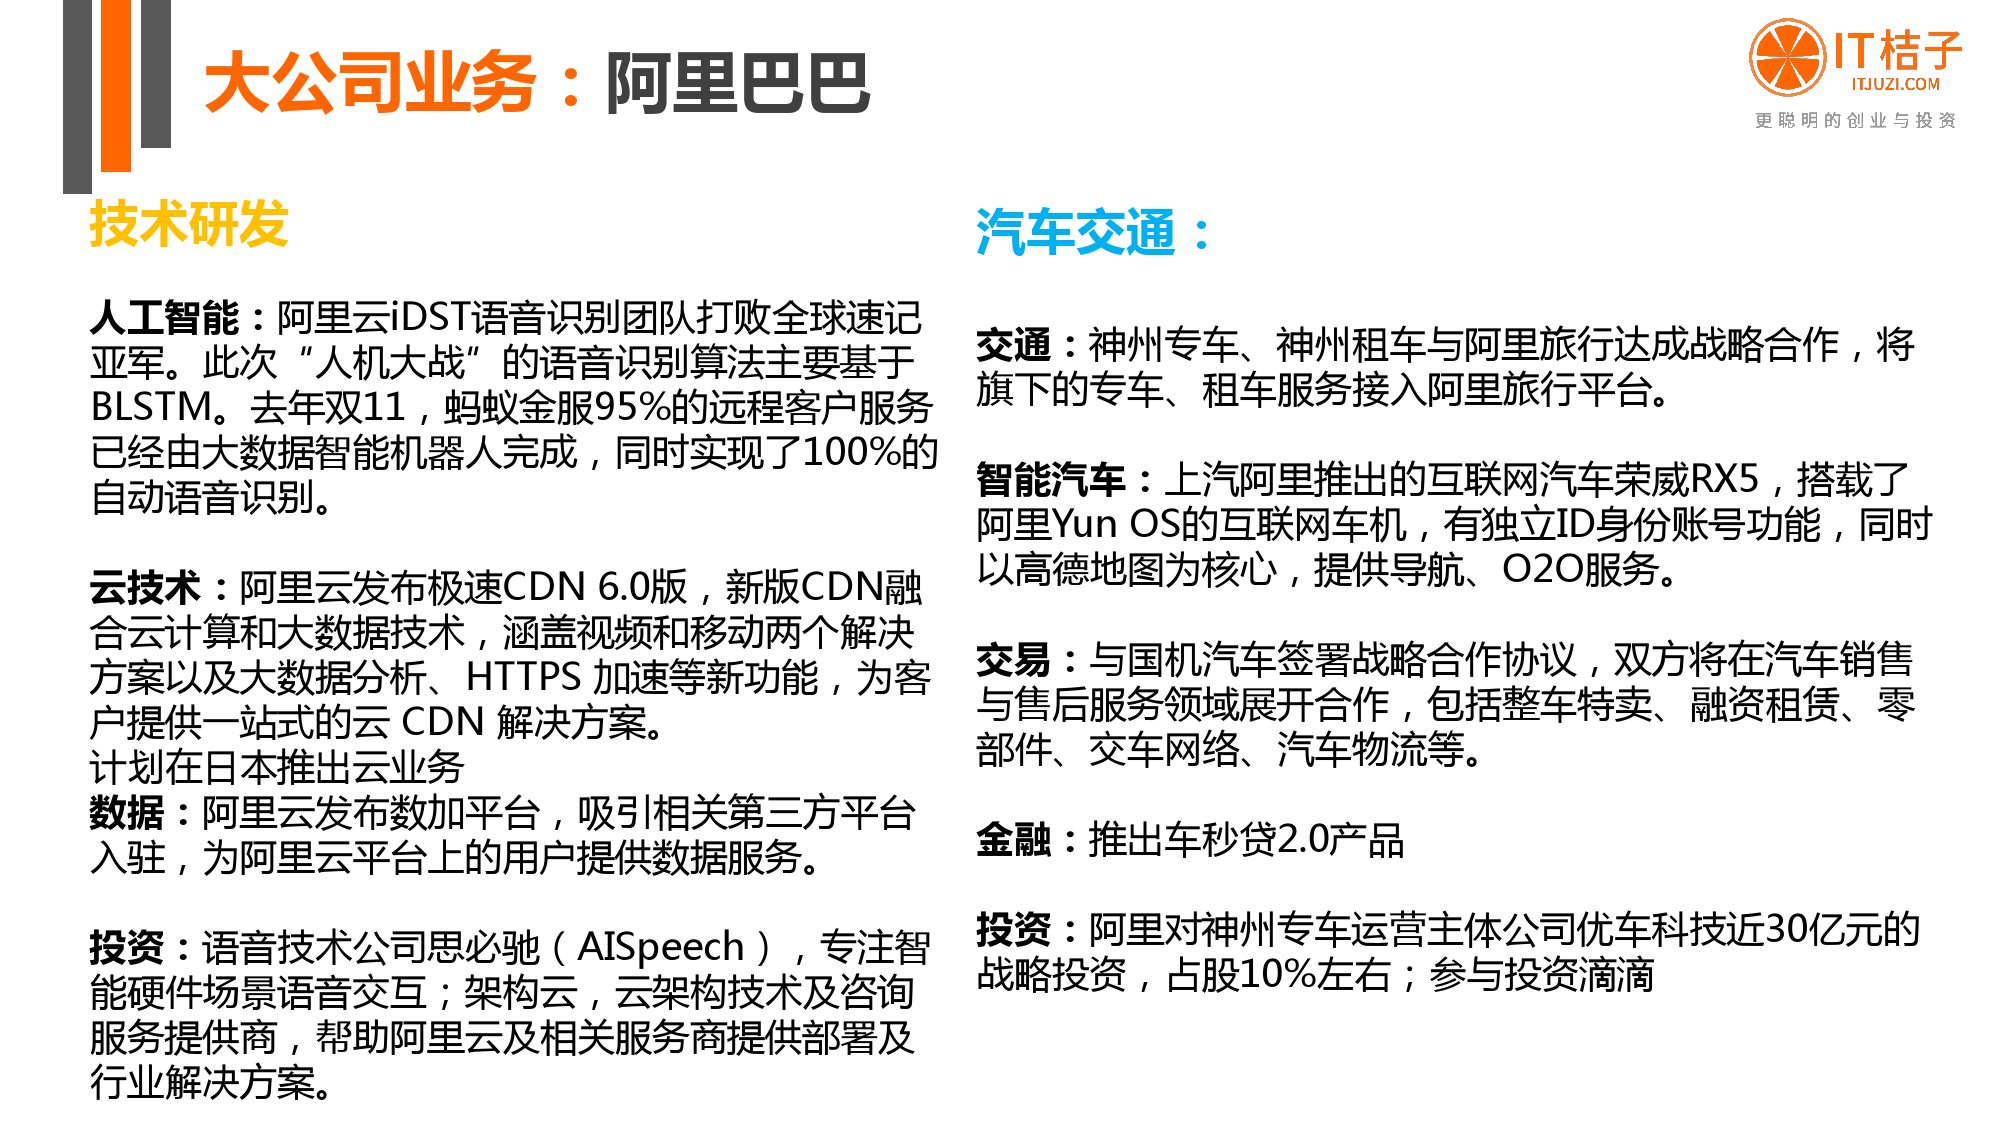 【IT桔子】2016年Q2中国互联网创业投资分析报告_000066